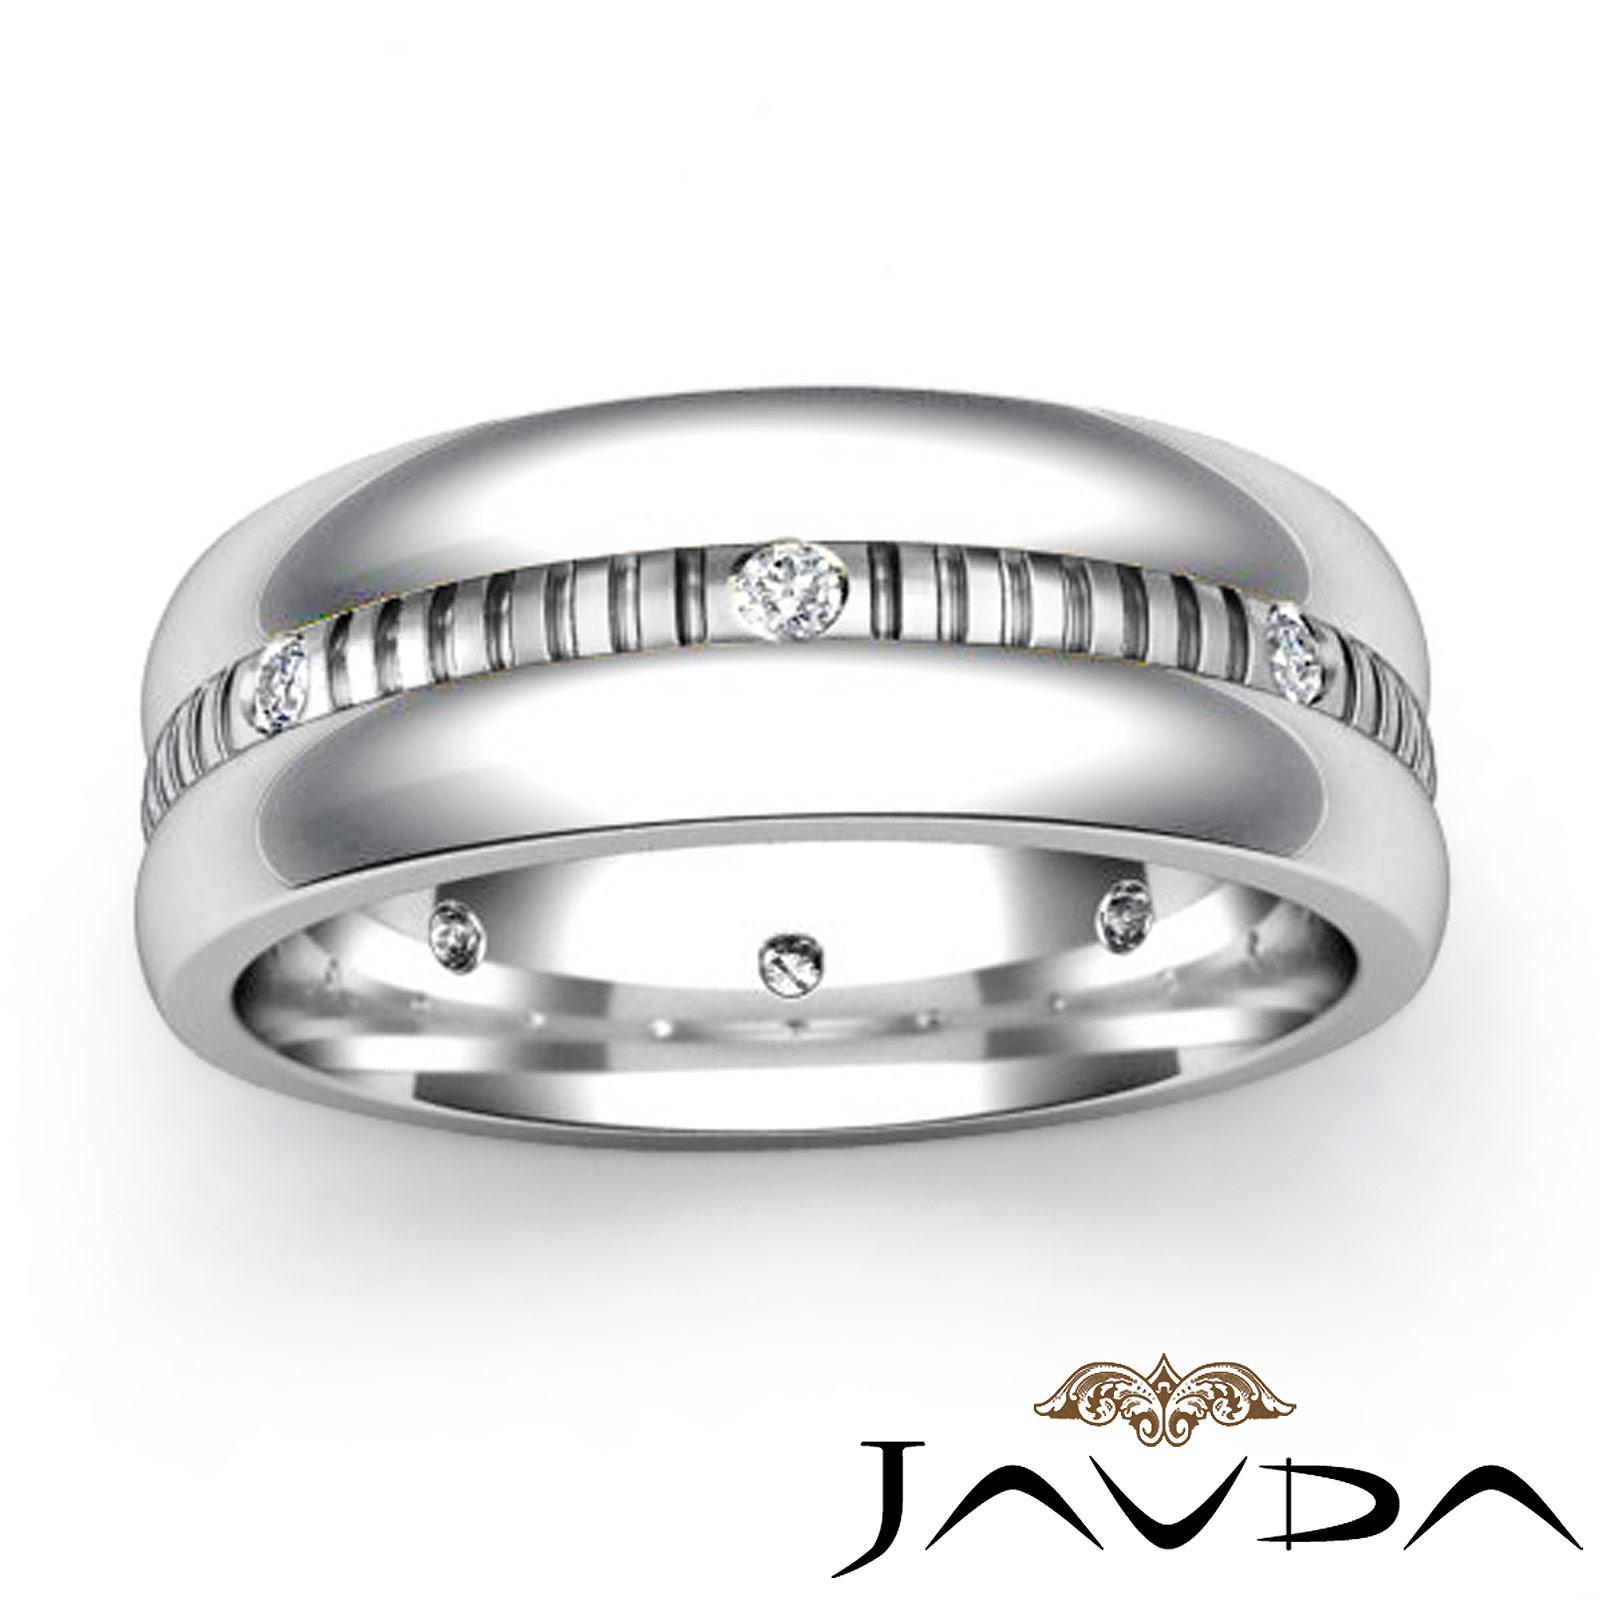 Round Bezel Diamond Mens Eternity Wedding Band 14k White Gold Solid Ring 016Ct